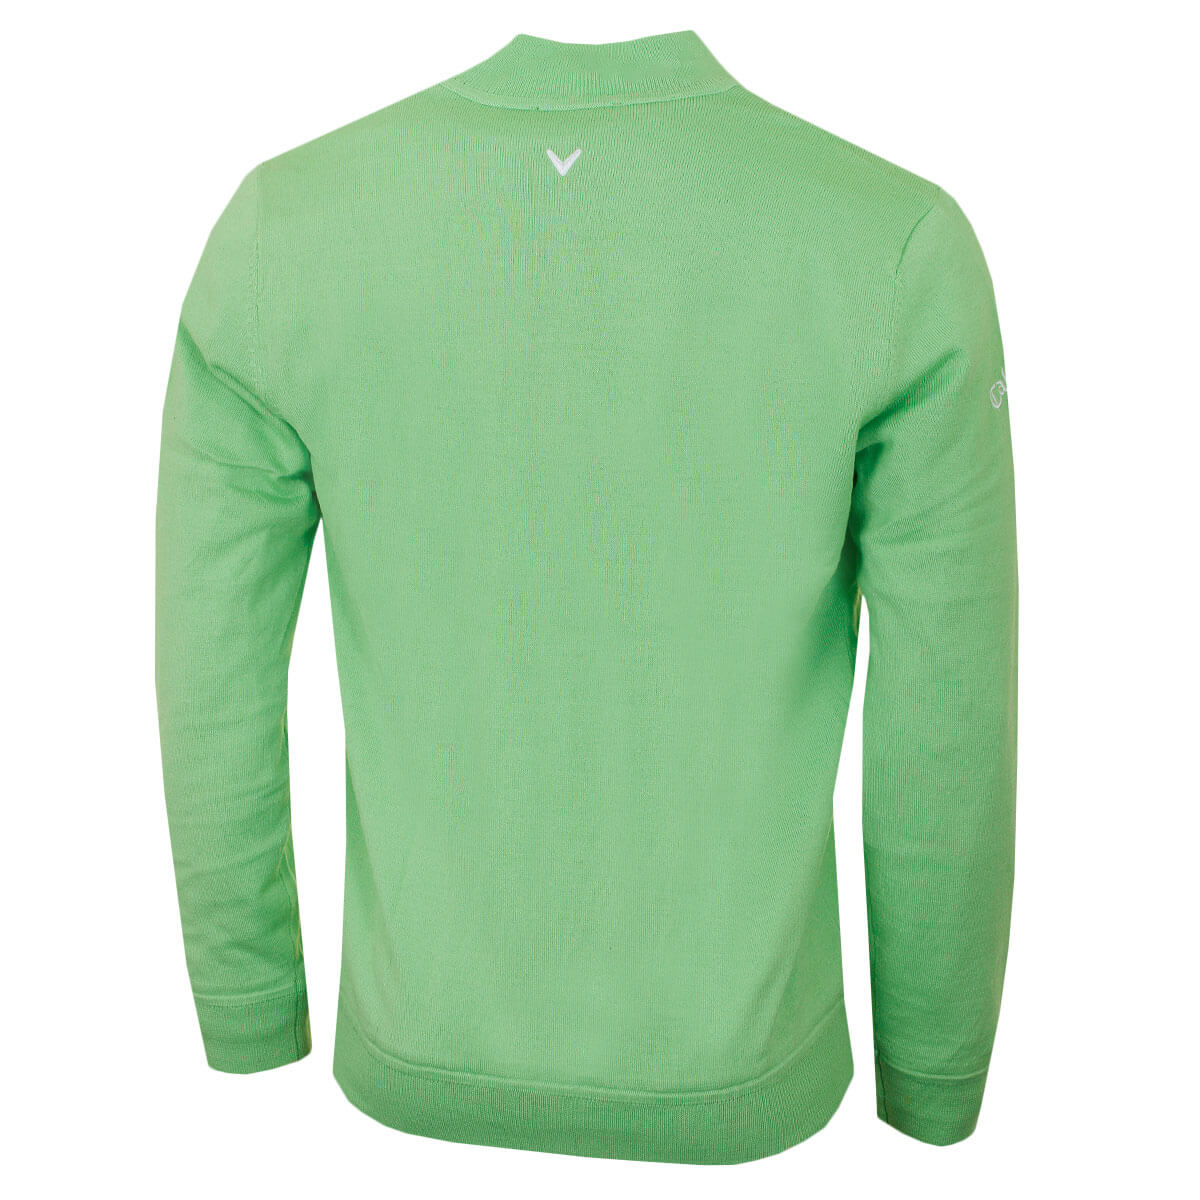 Callaway-Golf-Mens-1-4-Zip-Mock-Merino-Windproof-Sweater-Pullover-43-OFF-RRP thumbnail 12